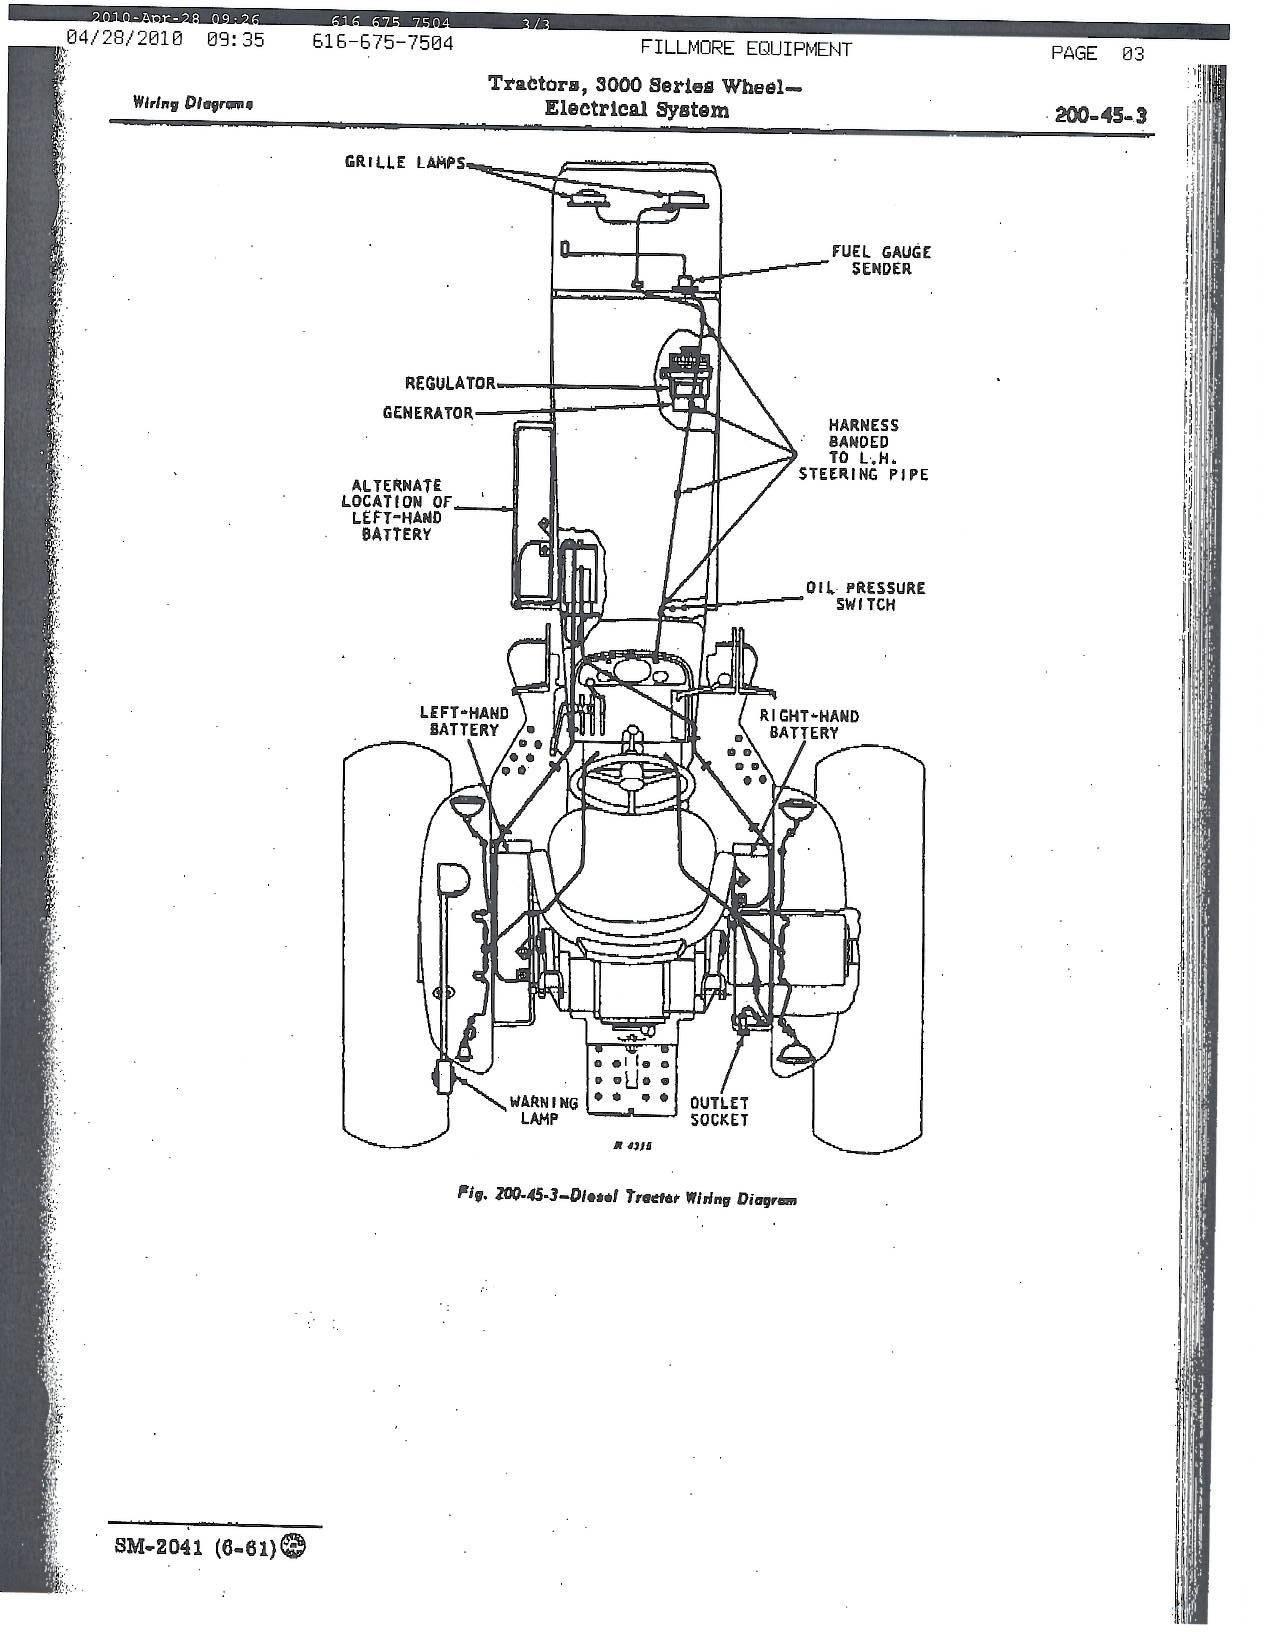 4020 john deere ignition wiring diy enthusiasts wiring diagrams u2022 rh okdrywall co John Deere 4020 Electrical System 4020 12 Volt Wiring Diagram